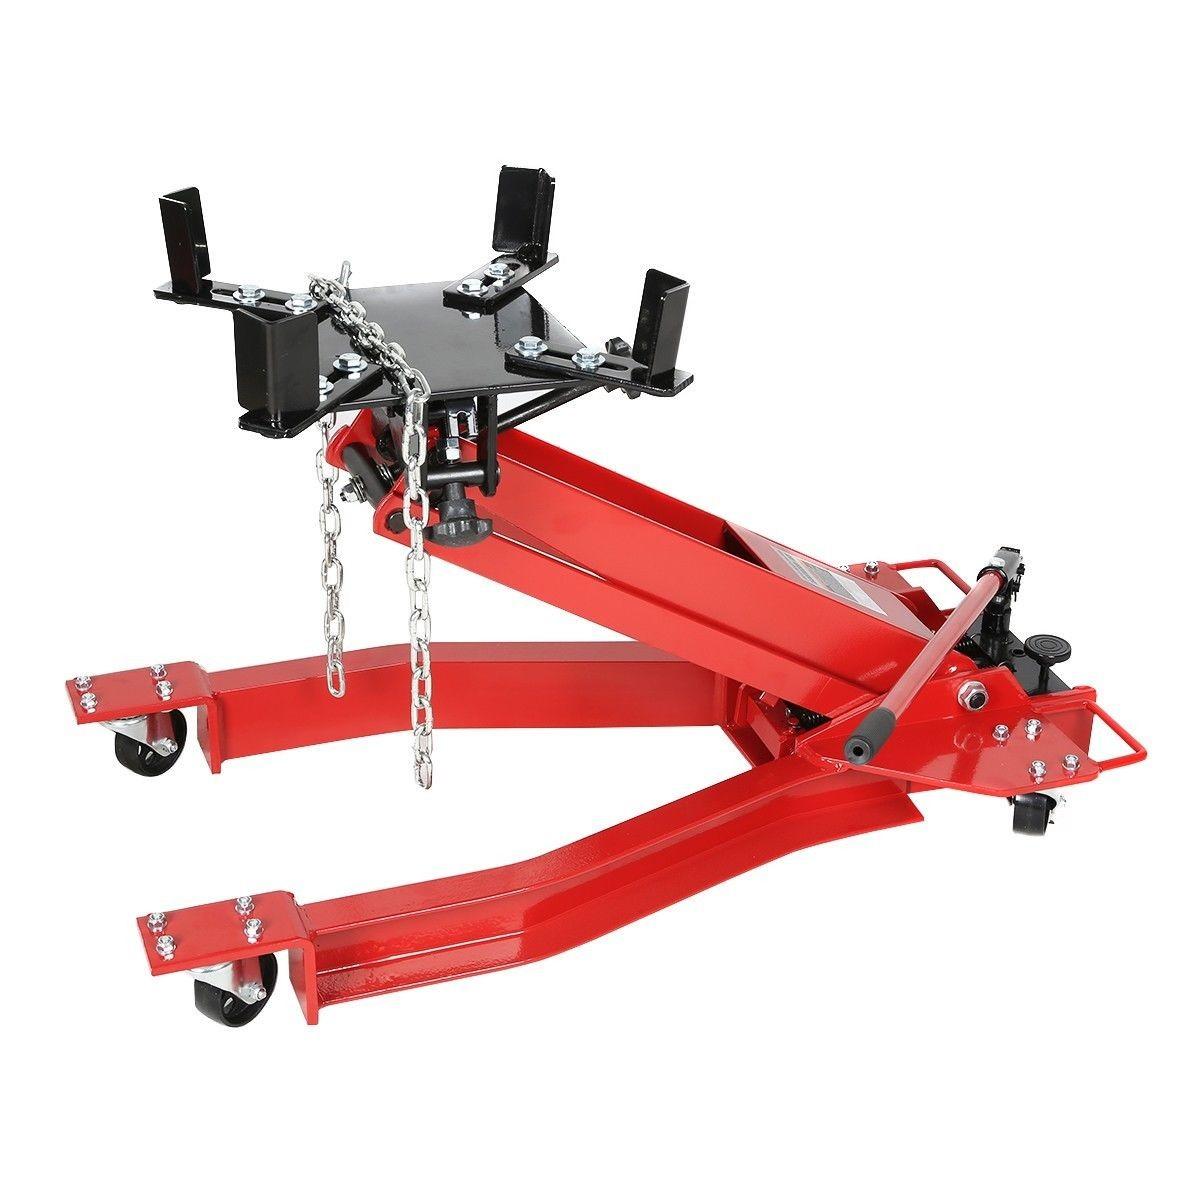 Automotive Lifts And Jacks : Lb ton transmission jack hydraulic for car lift